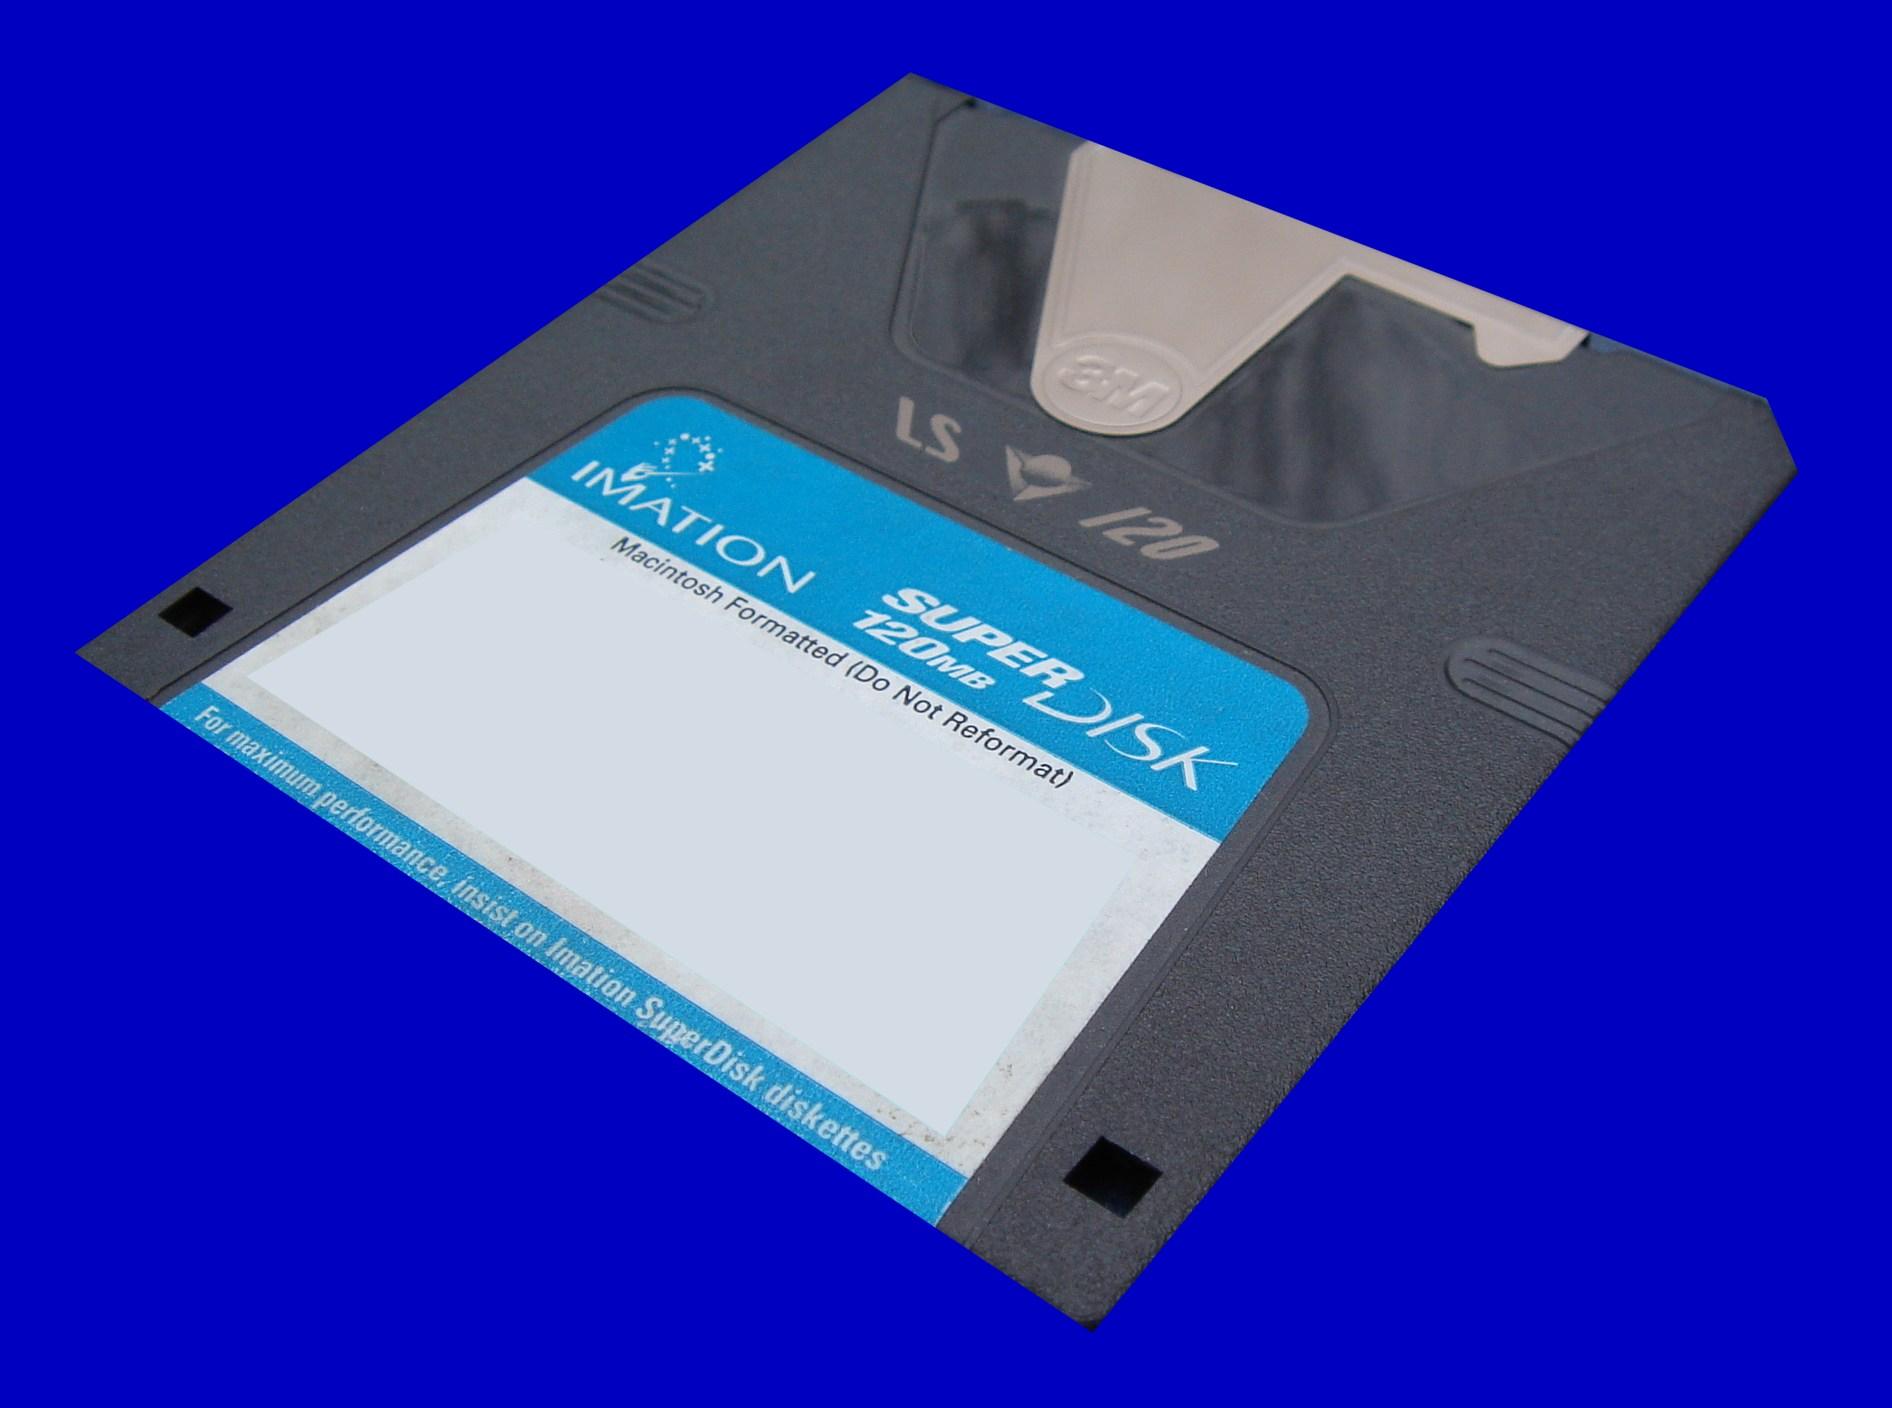 A SuperDisk ready for file transfer.